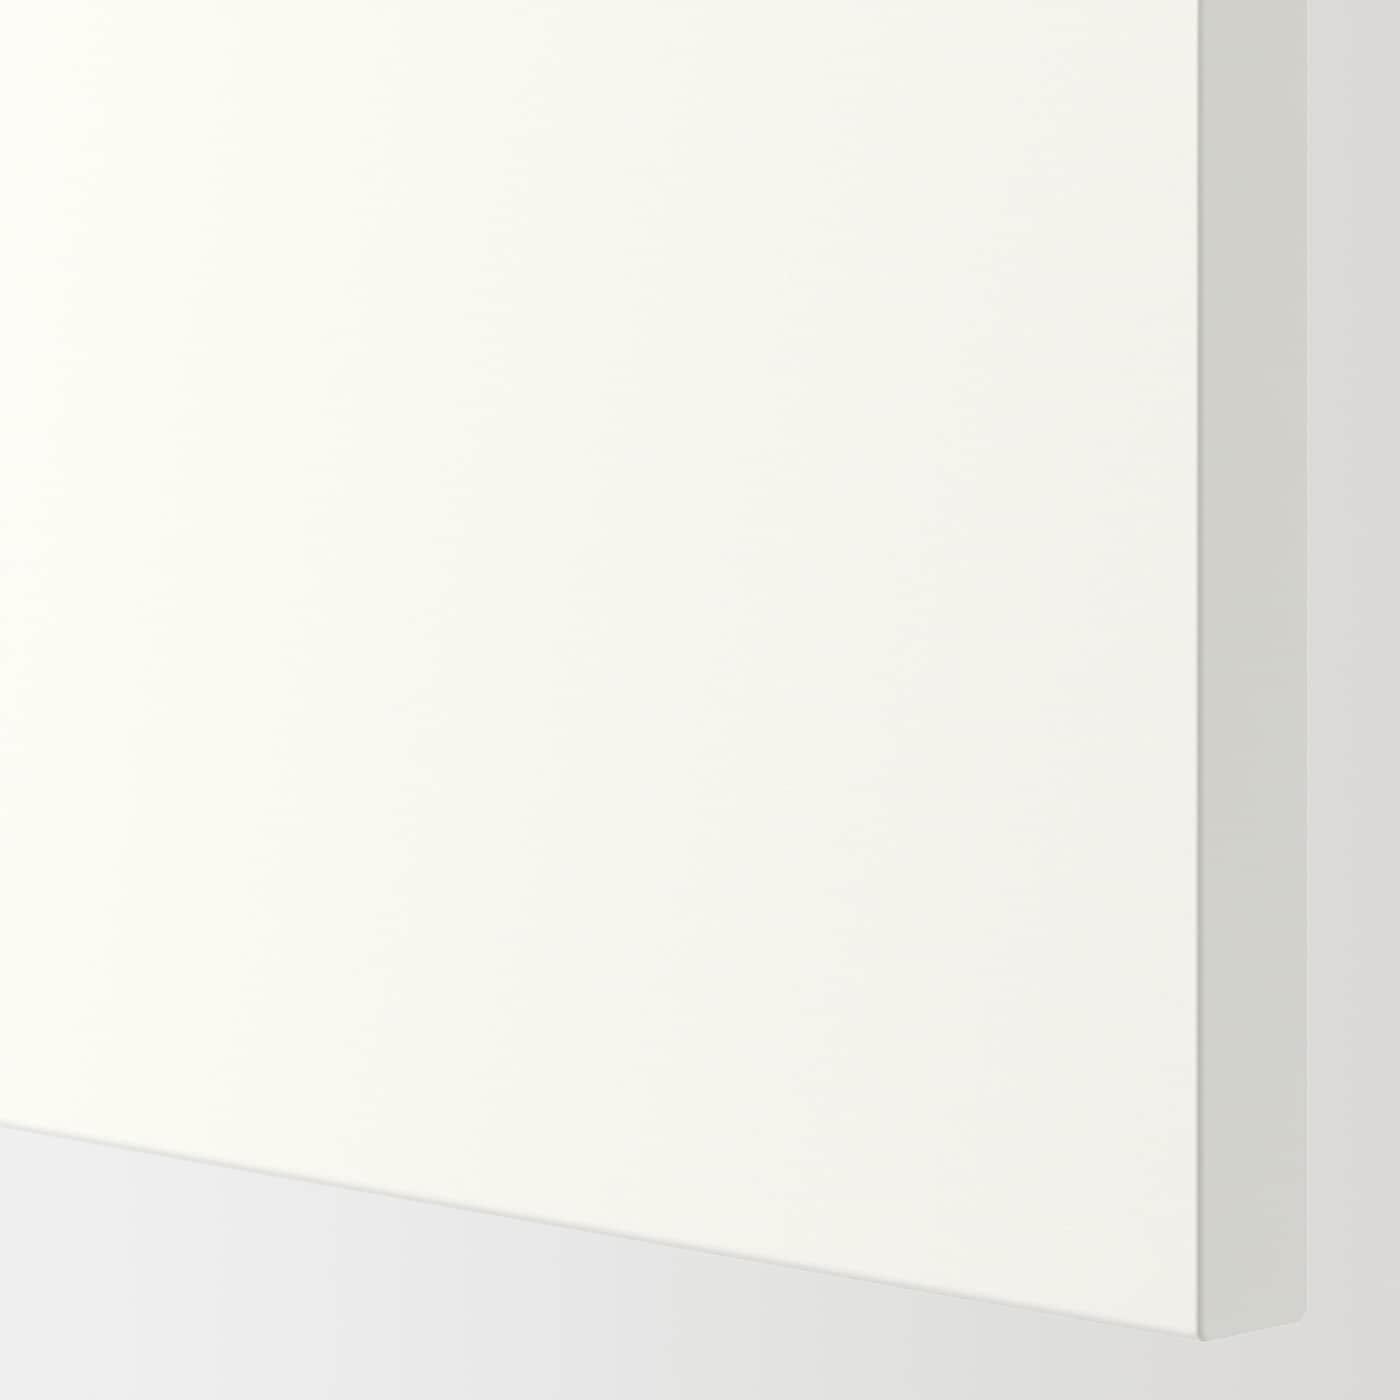 ENHET Bc w shlf/door, white, 60x62x75 cm